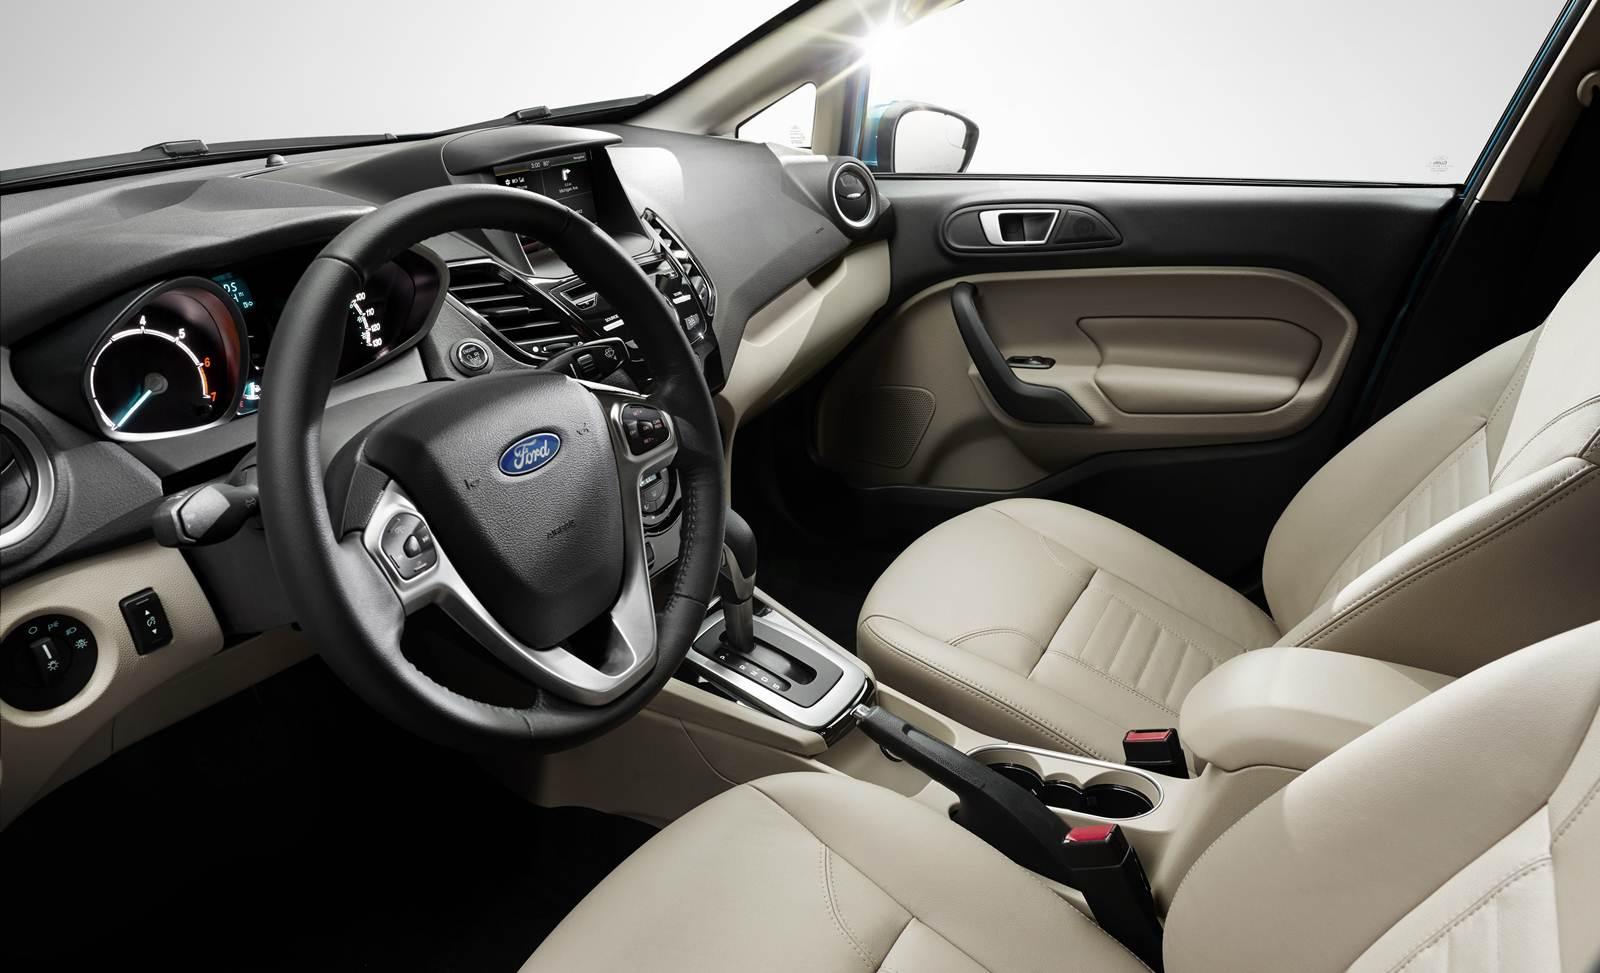 Fiesta 2014 Automático DCT-6 - interior